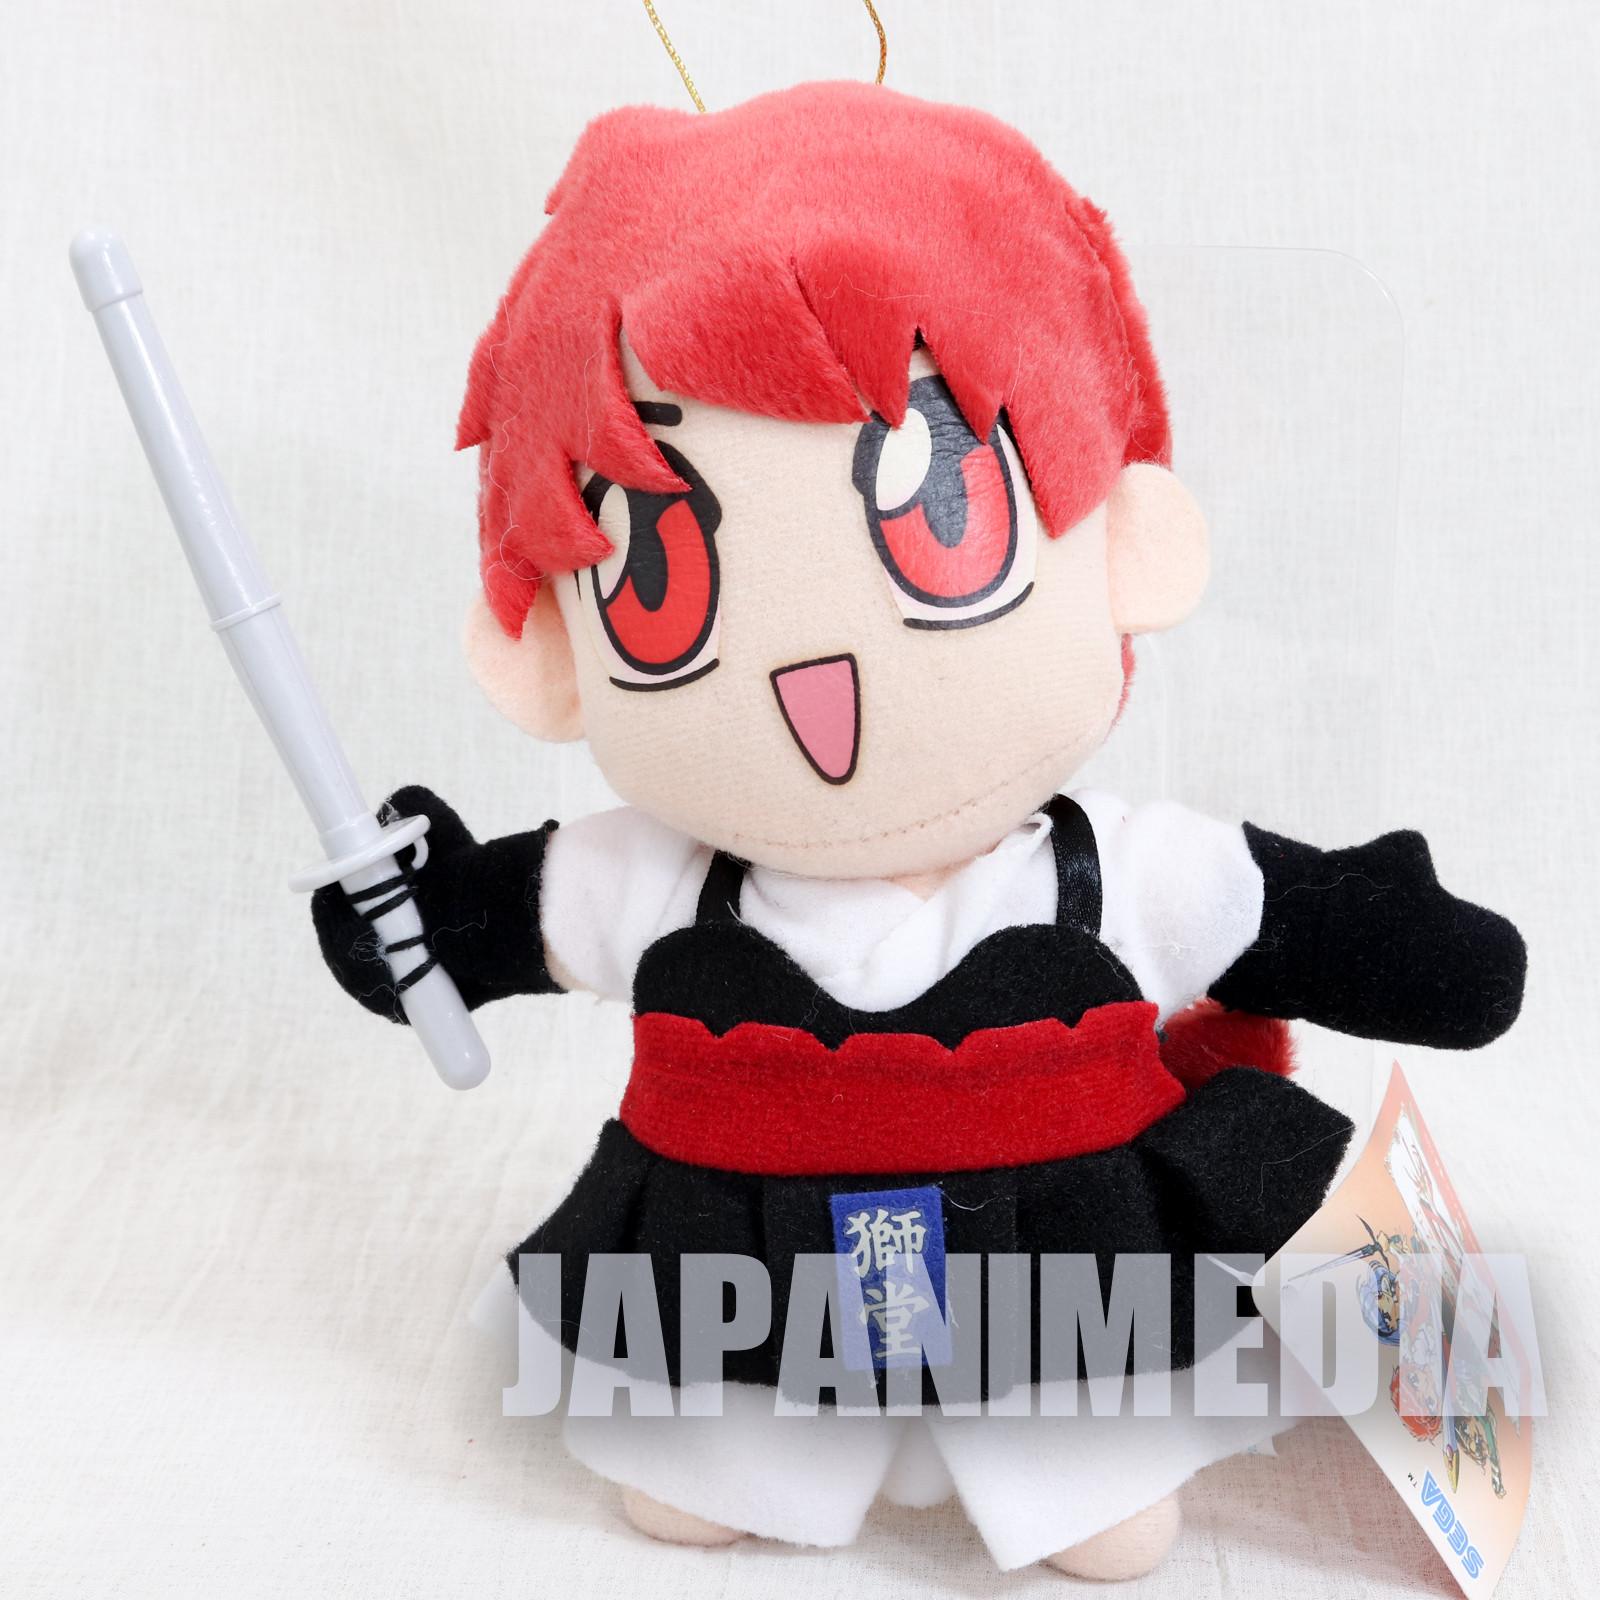 Retro Magic Knight Rayearth Hikaru Shidou Kendo Plush Doll SEGA CLAMP JAPAN